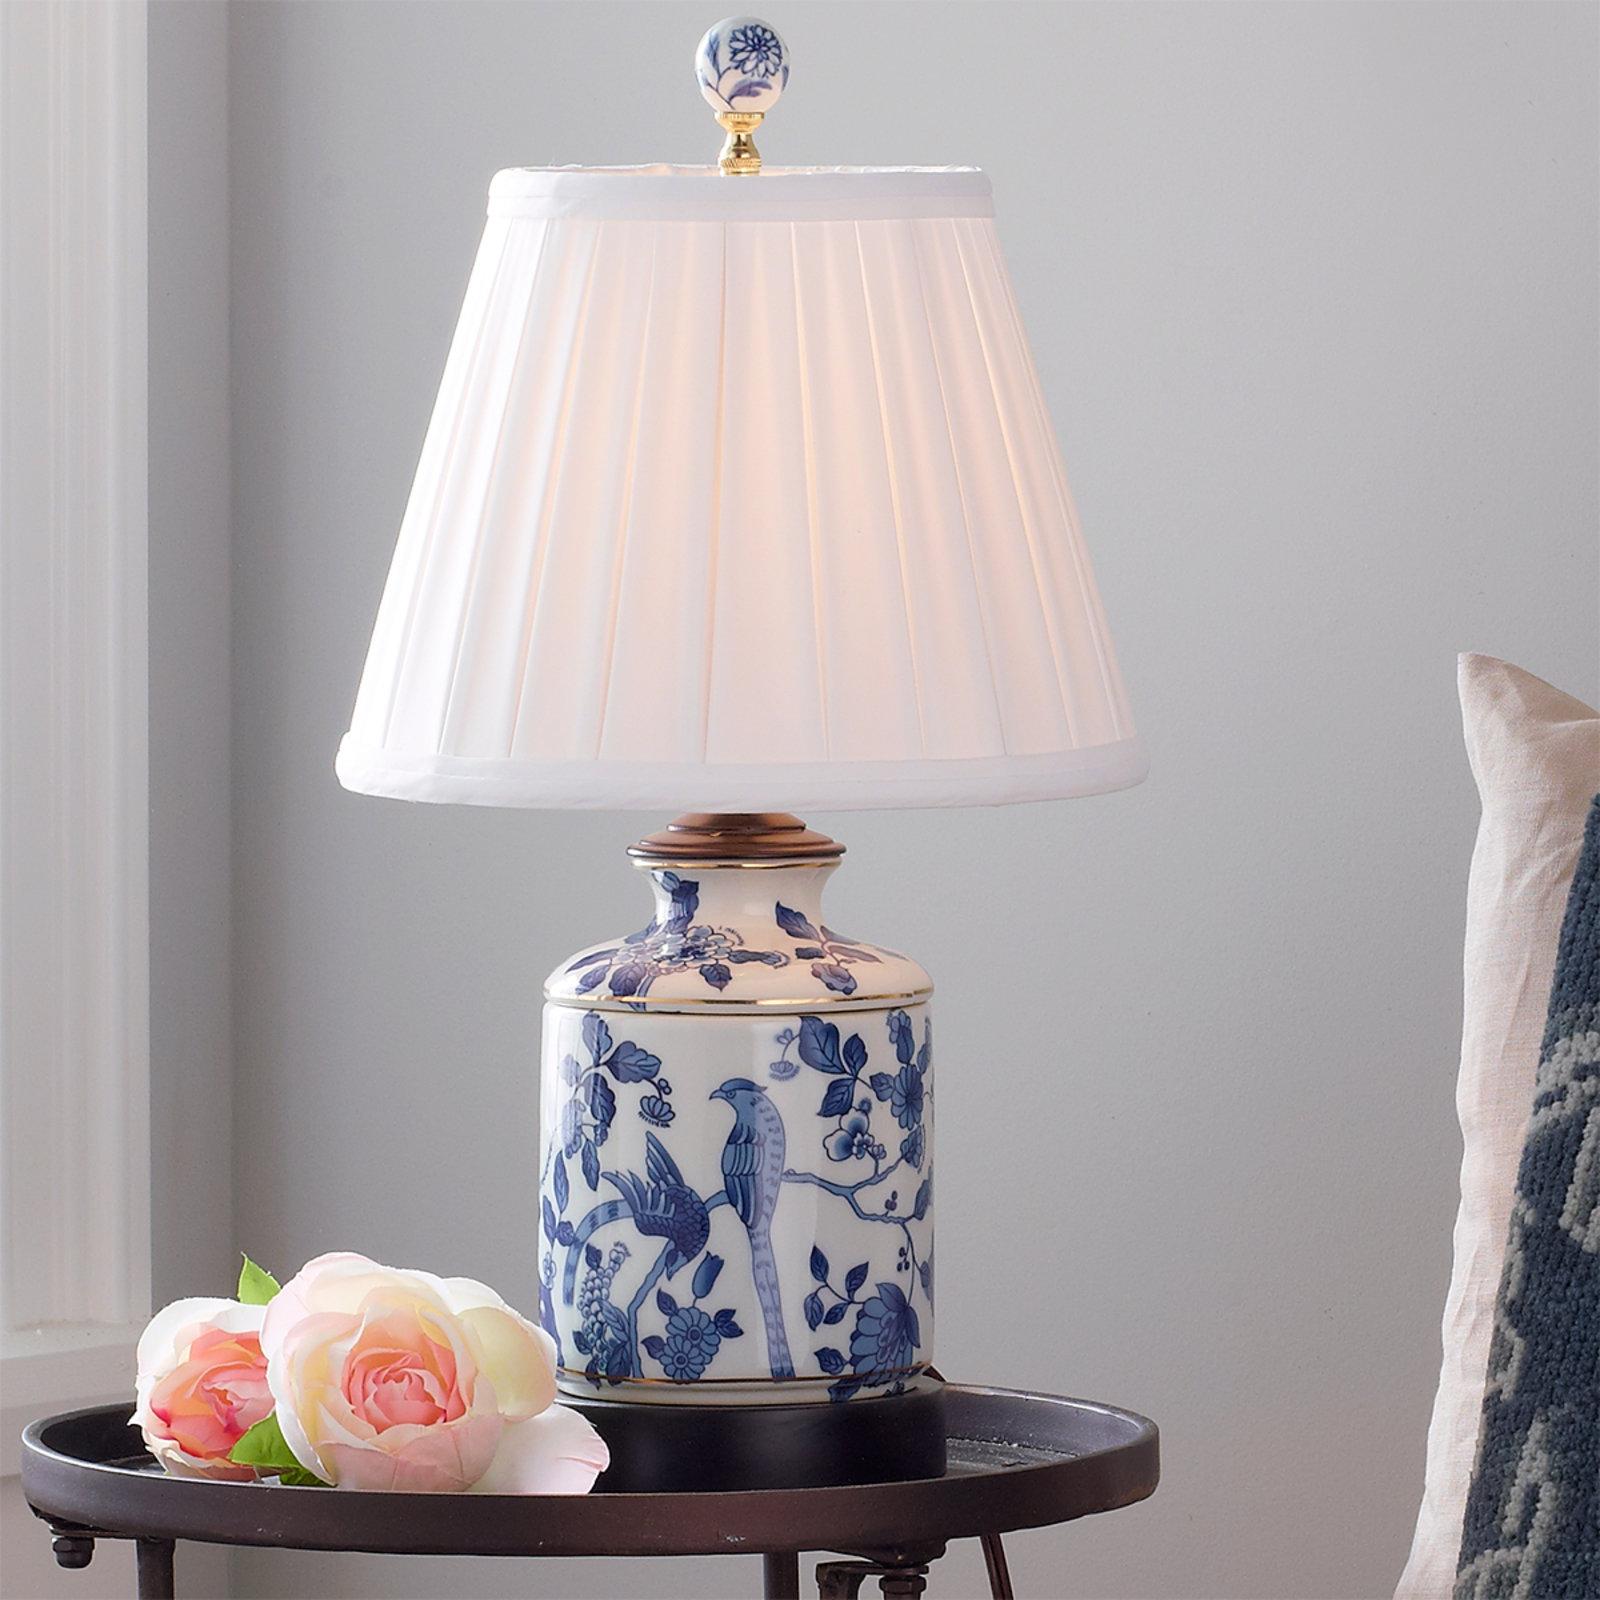 blue and white porcelain mini table lamp